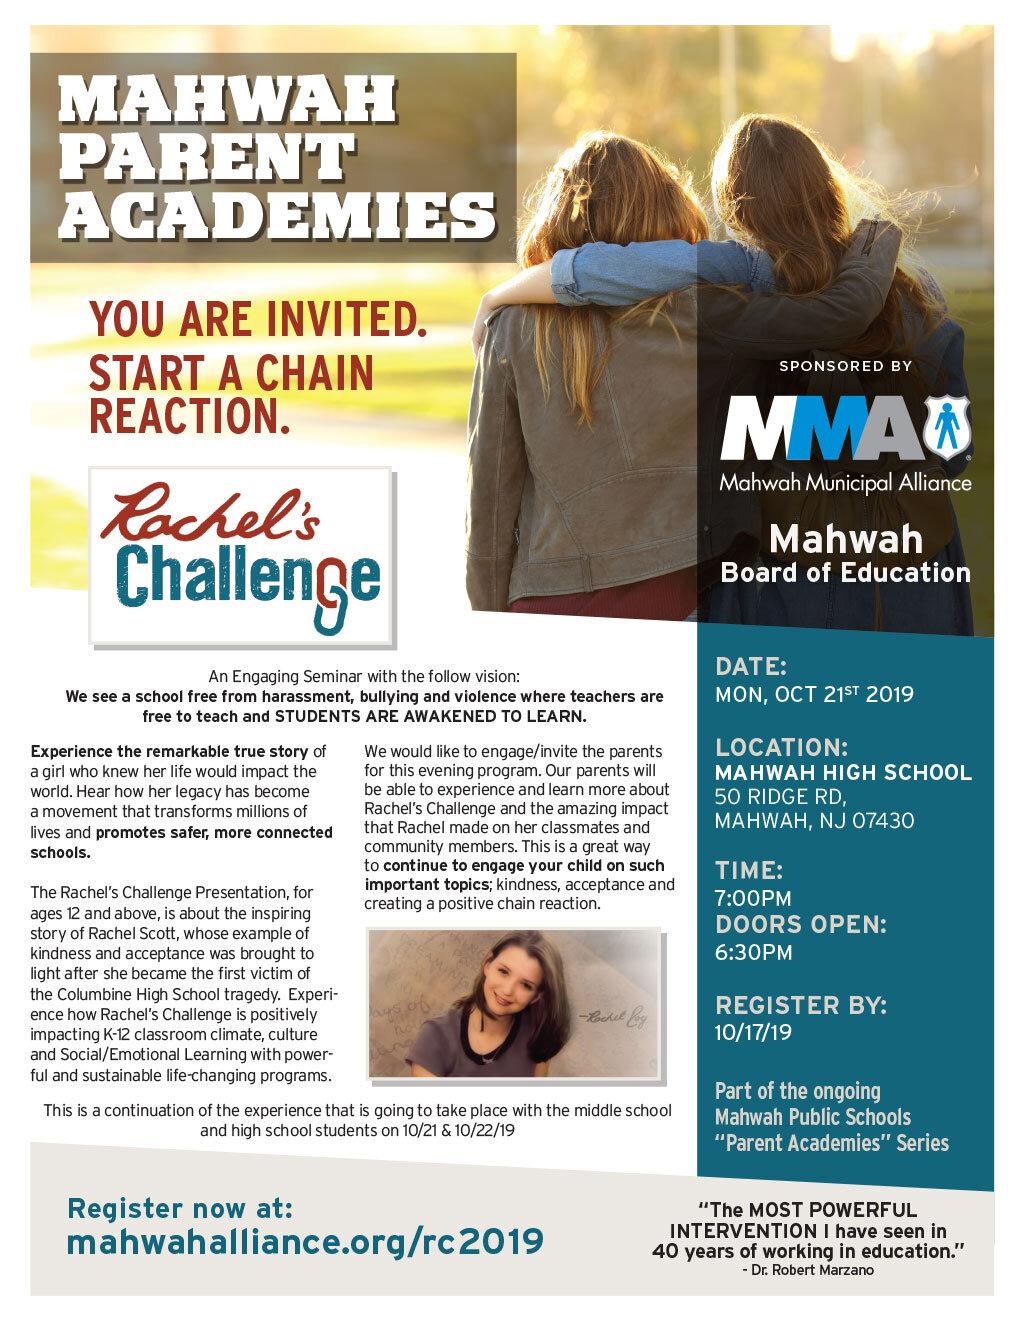 MMA-Rachels-Challenge-Seminar-10-19.jpg